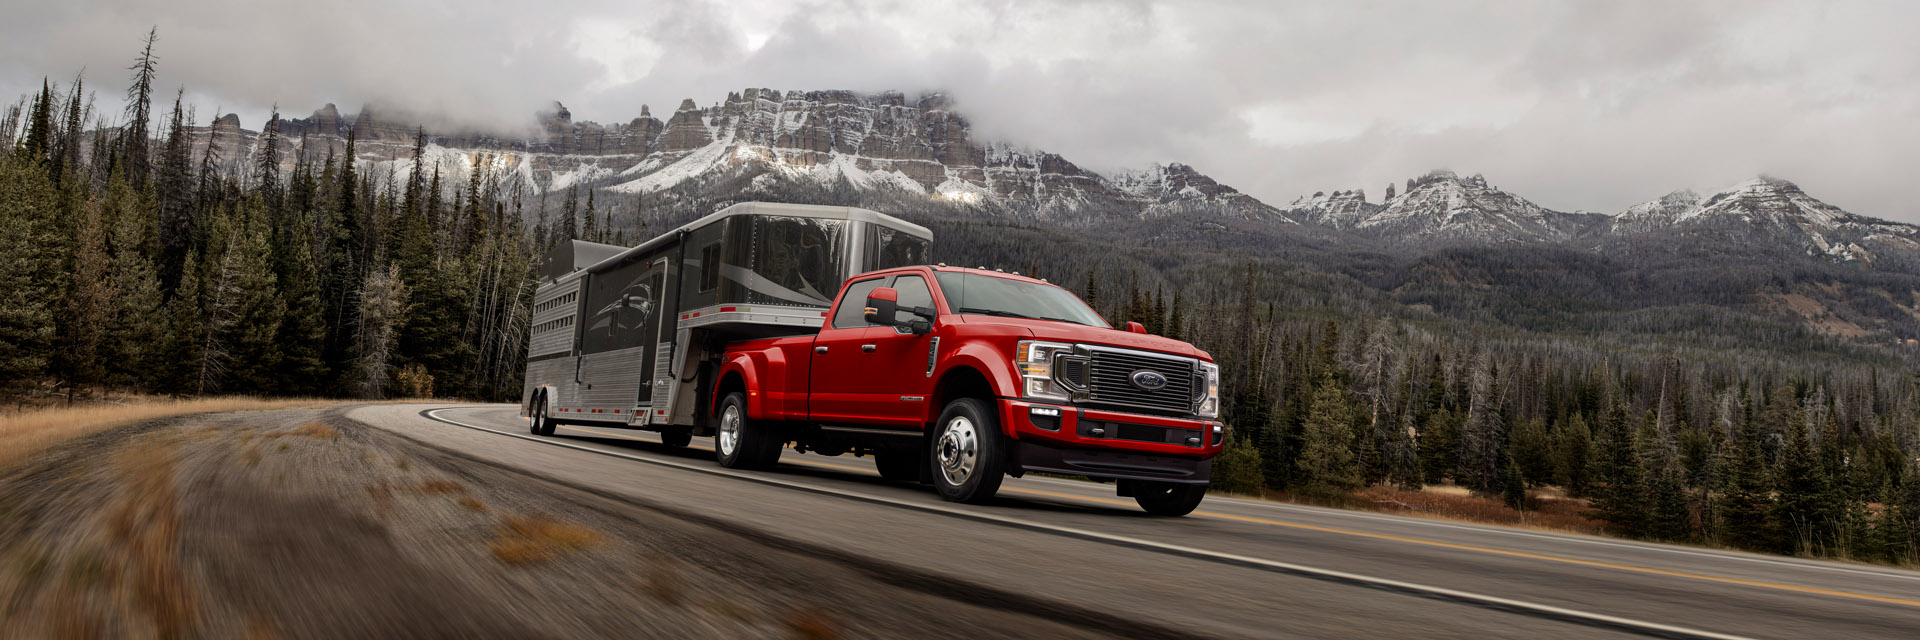 Llega la gama 2020 Super Duty a las Ford F-Series